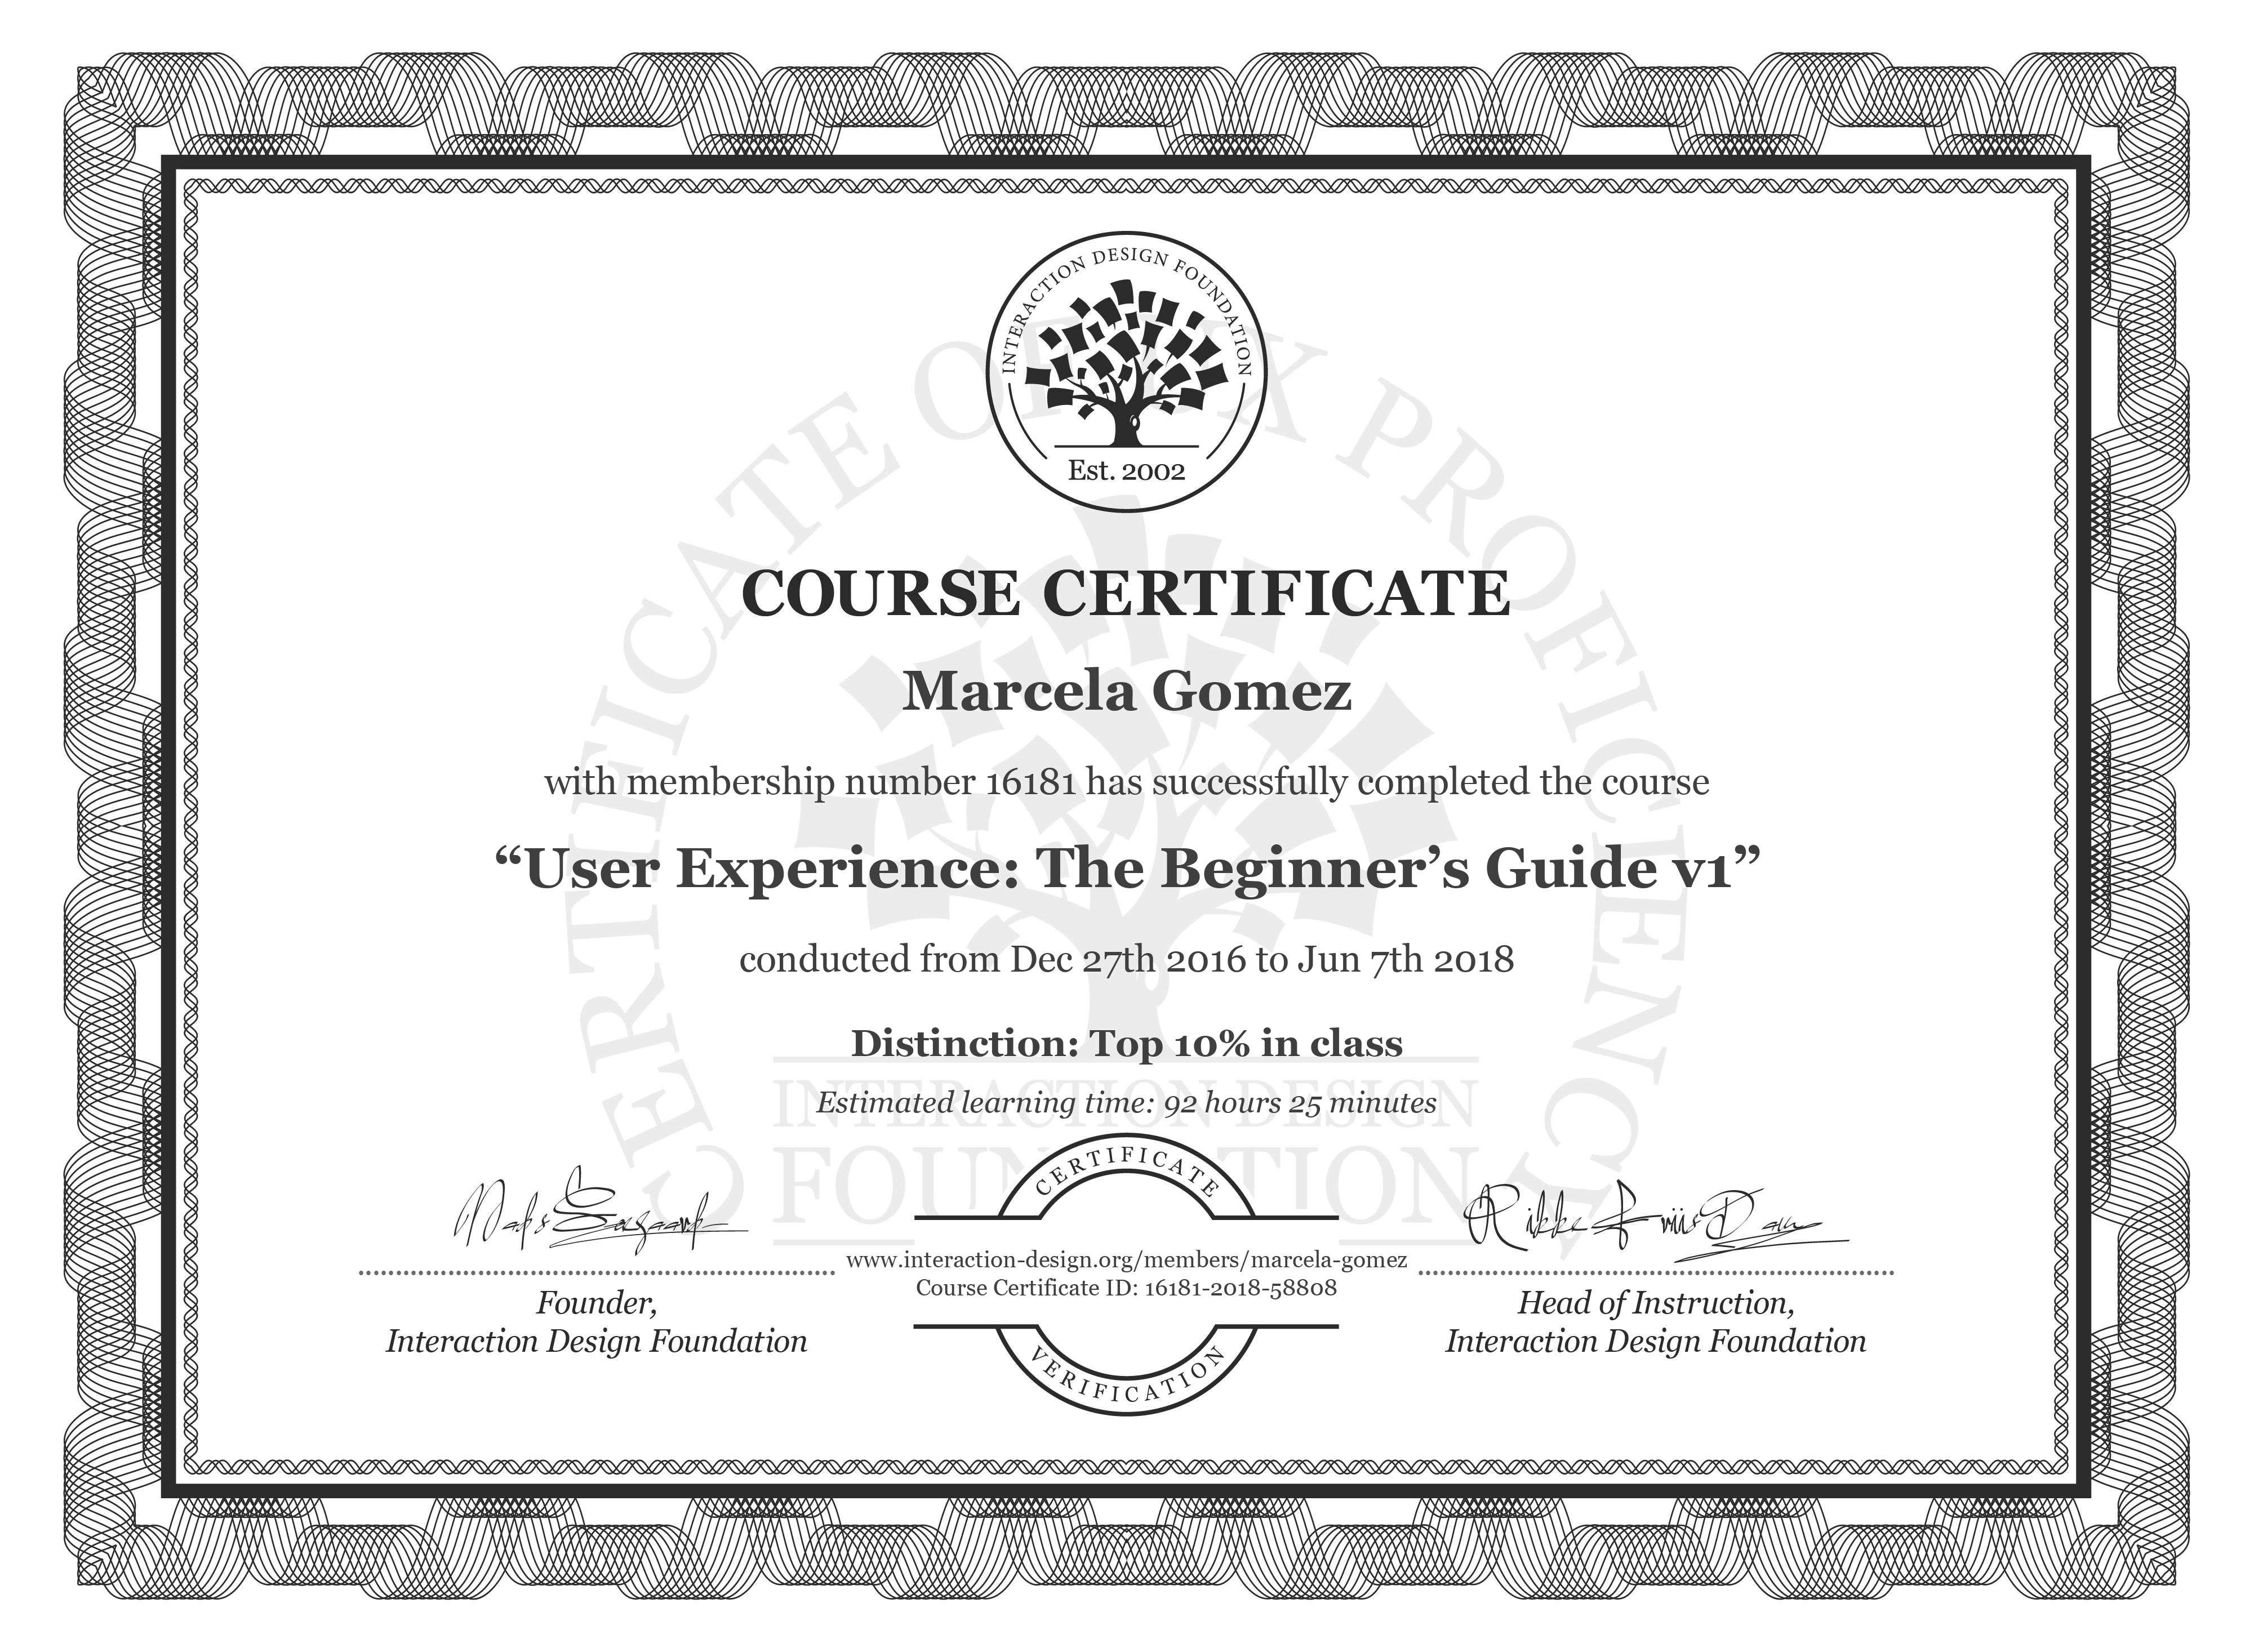 Marcela Gómez: Course Certificate - User Experience: The Beginner's Guide